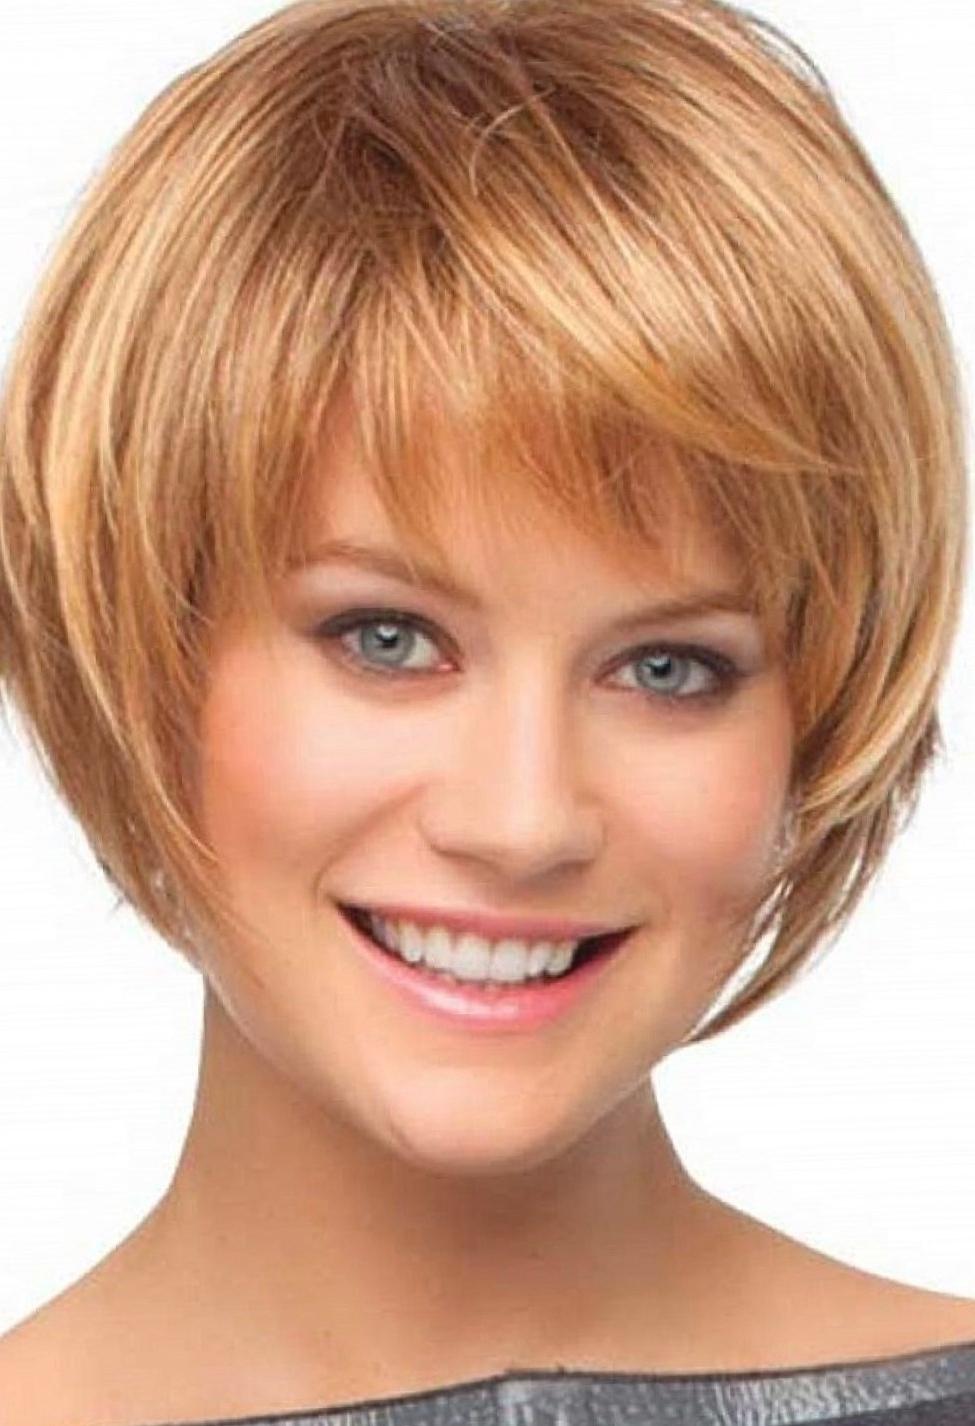 Short Layered Bob Hairstyles (View 12 of 15)